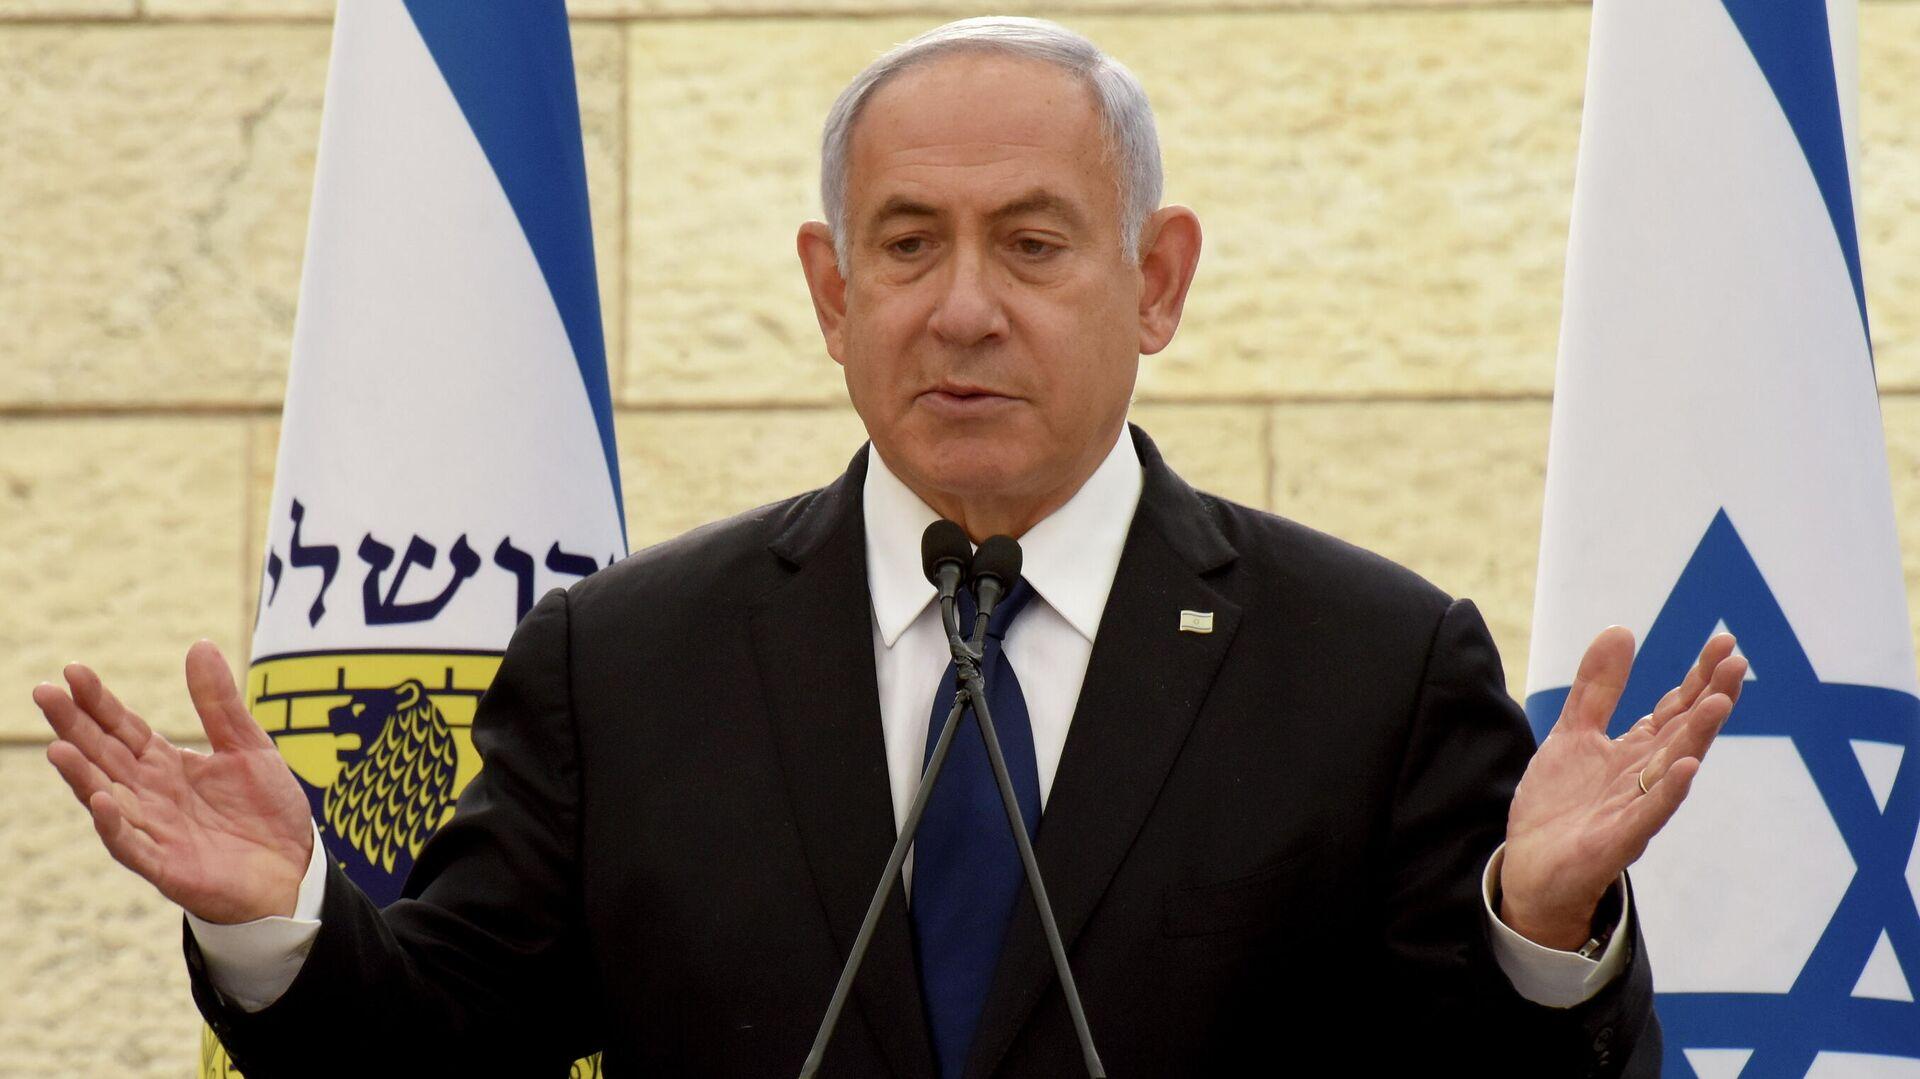 Benjamín Netanyahu, primer ministro israelí - Sputnik Mundo, 1920, 16.05.2021